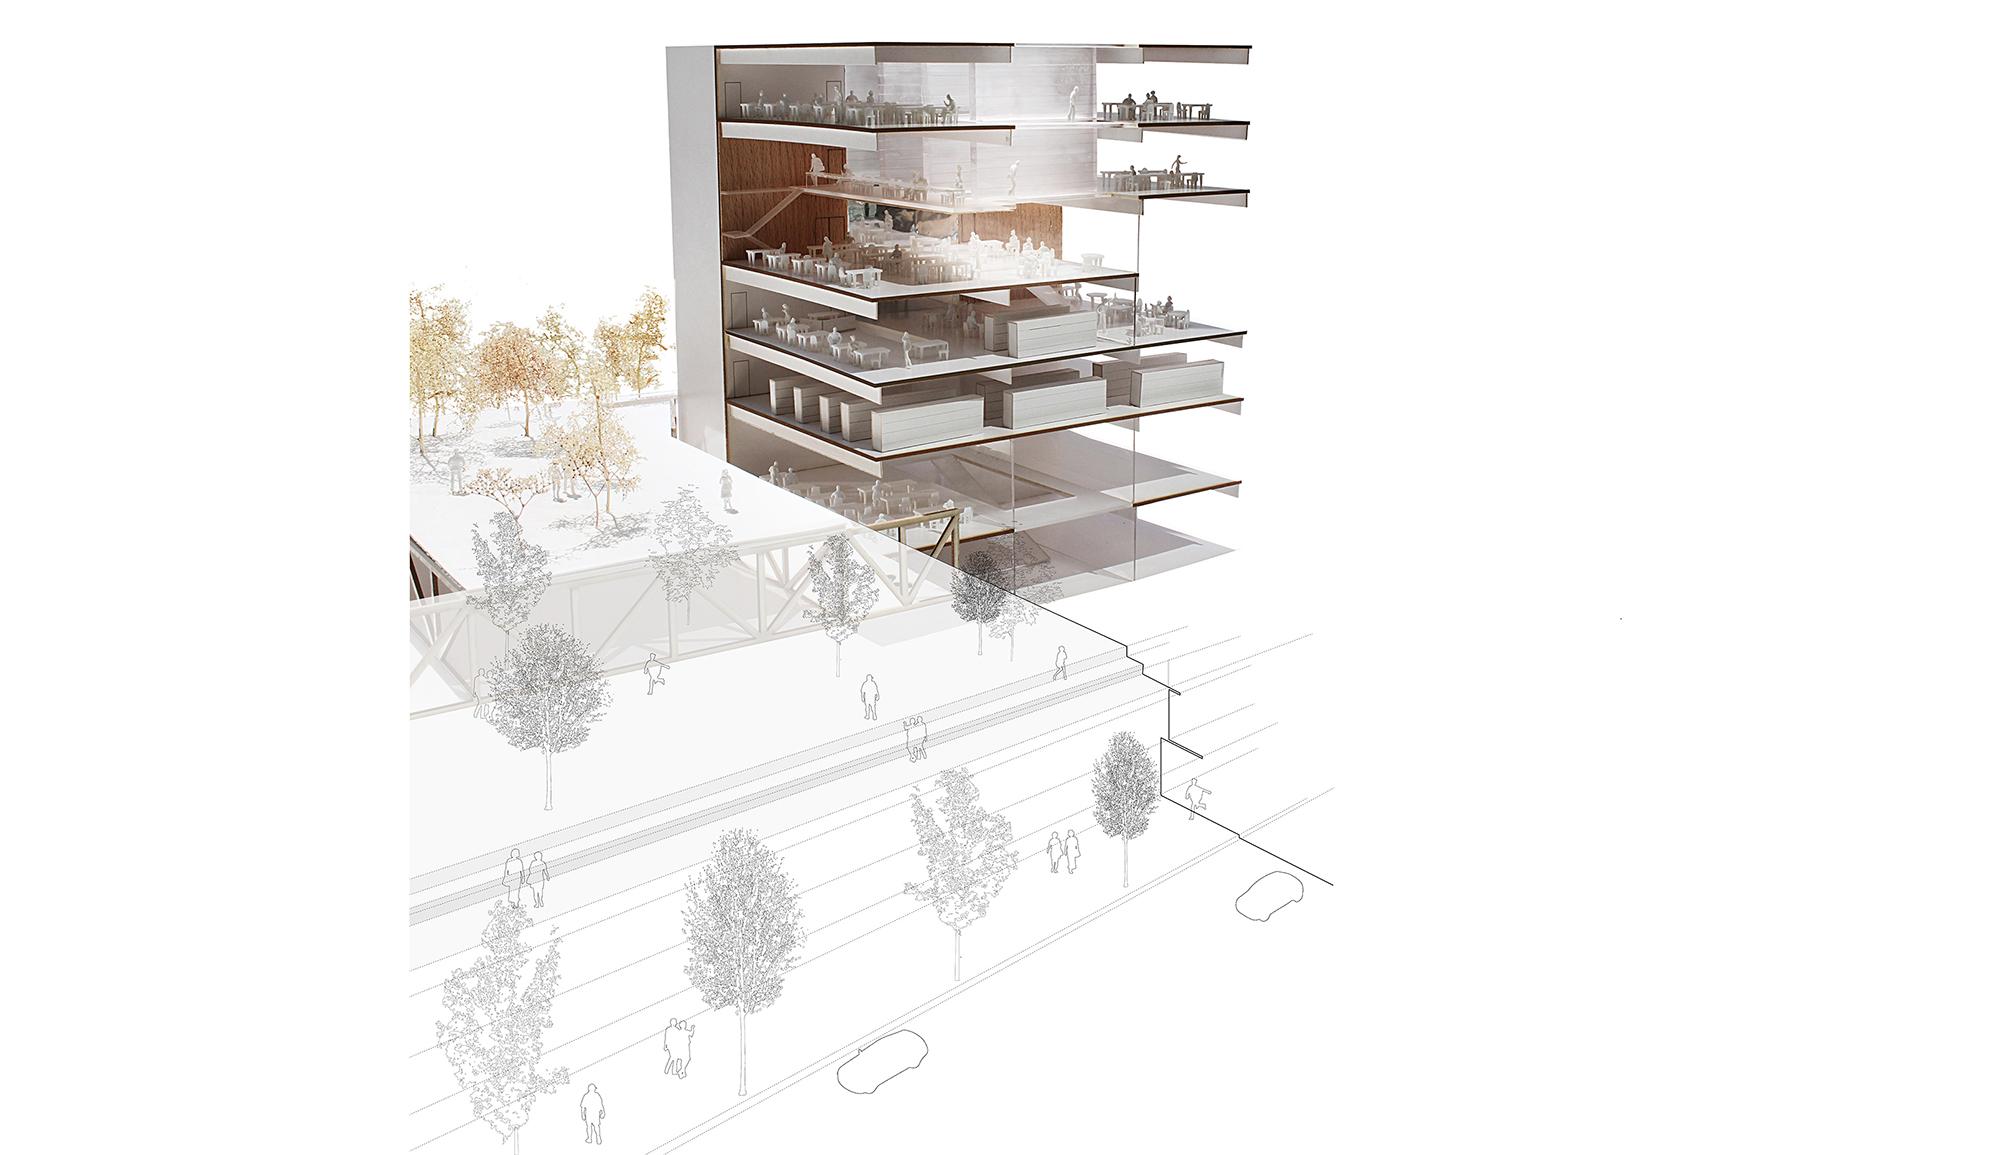 Section - Condorcet Campus - Josep Lluís Mateo